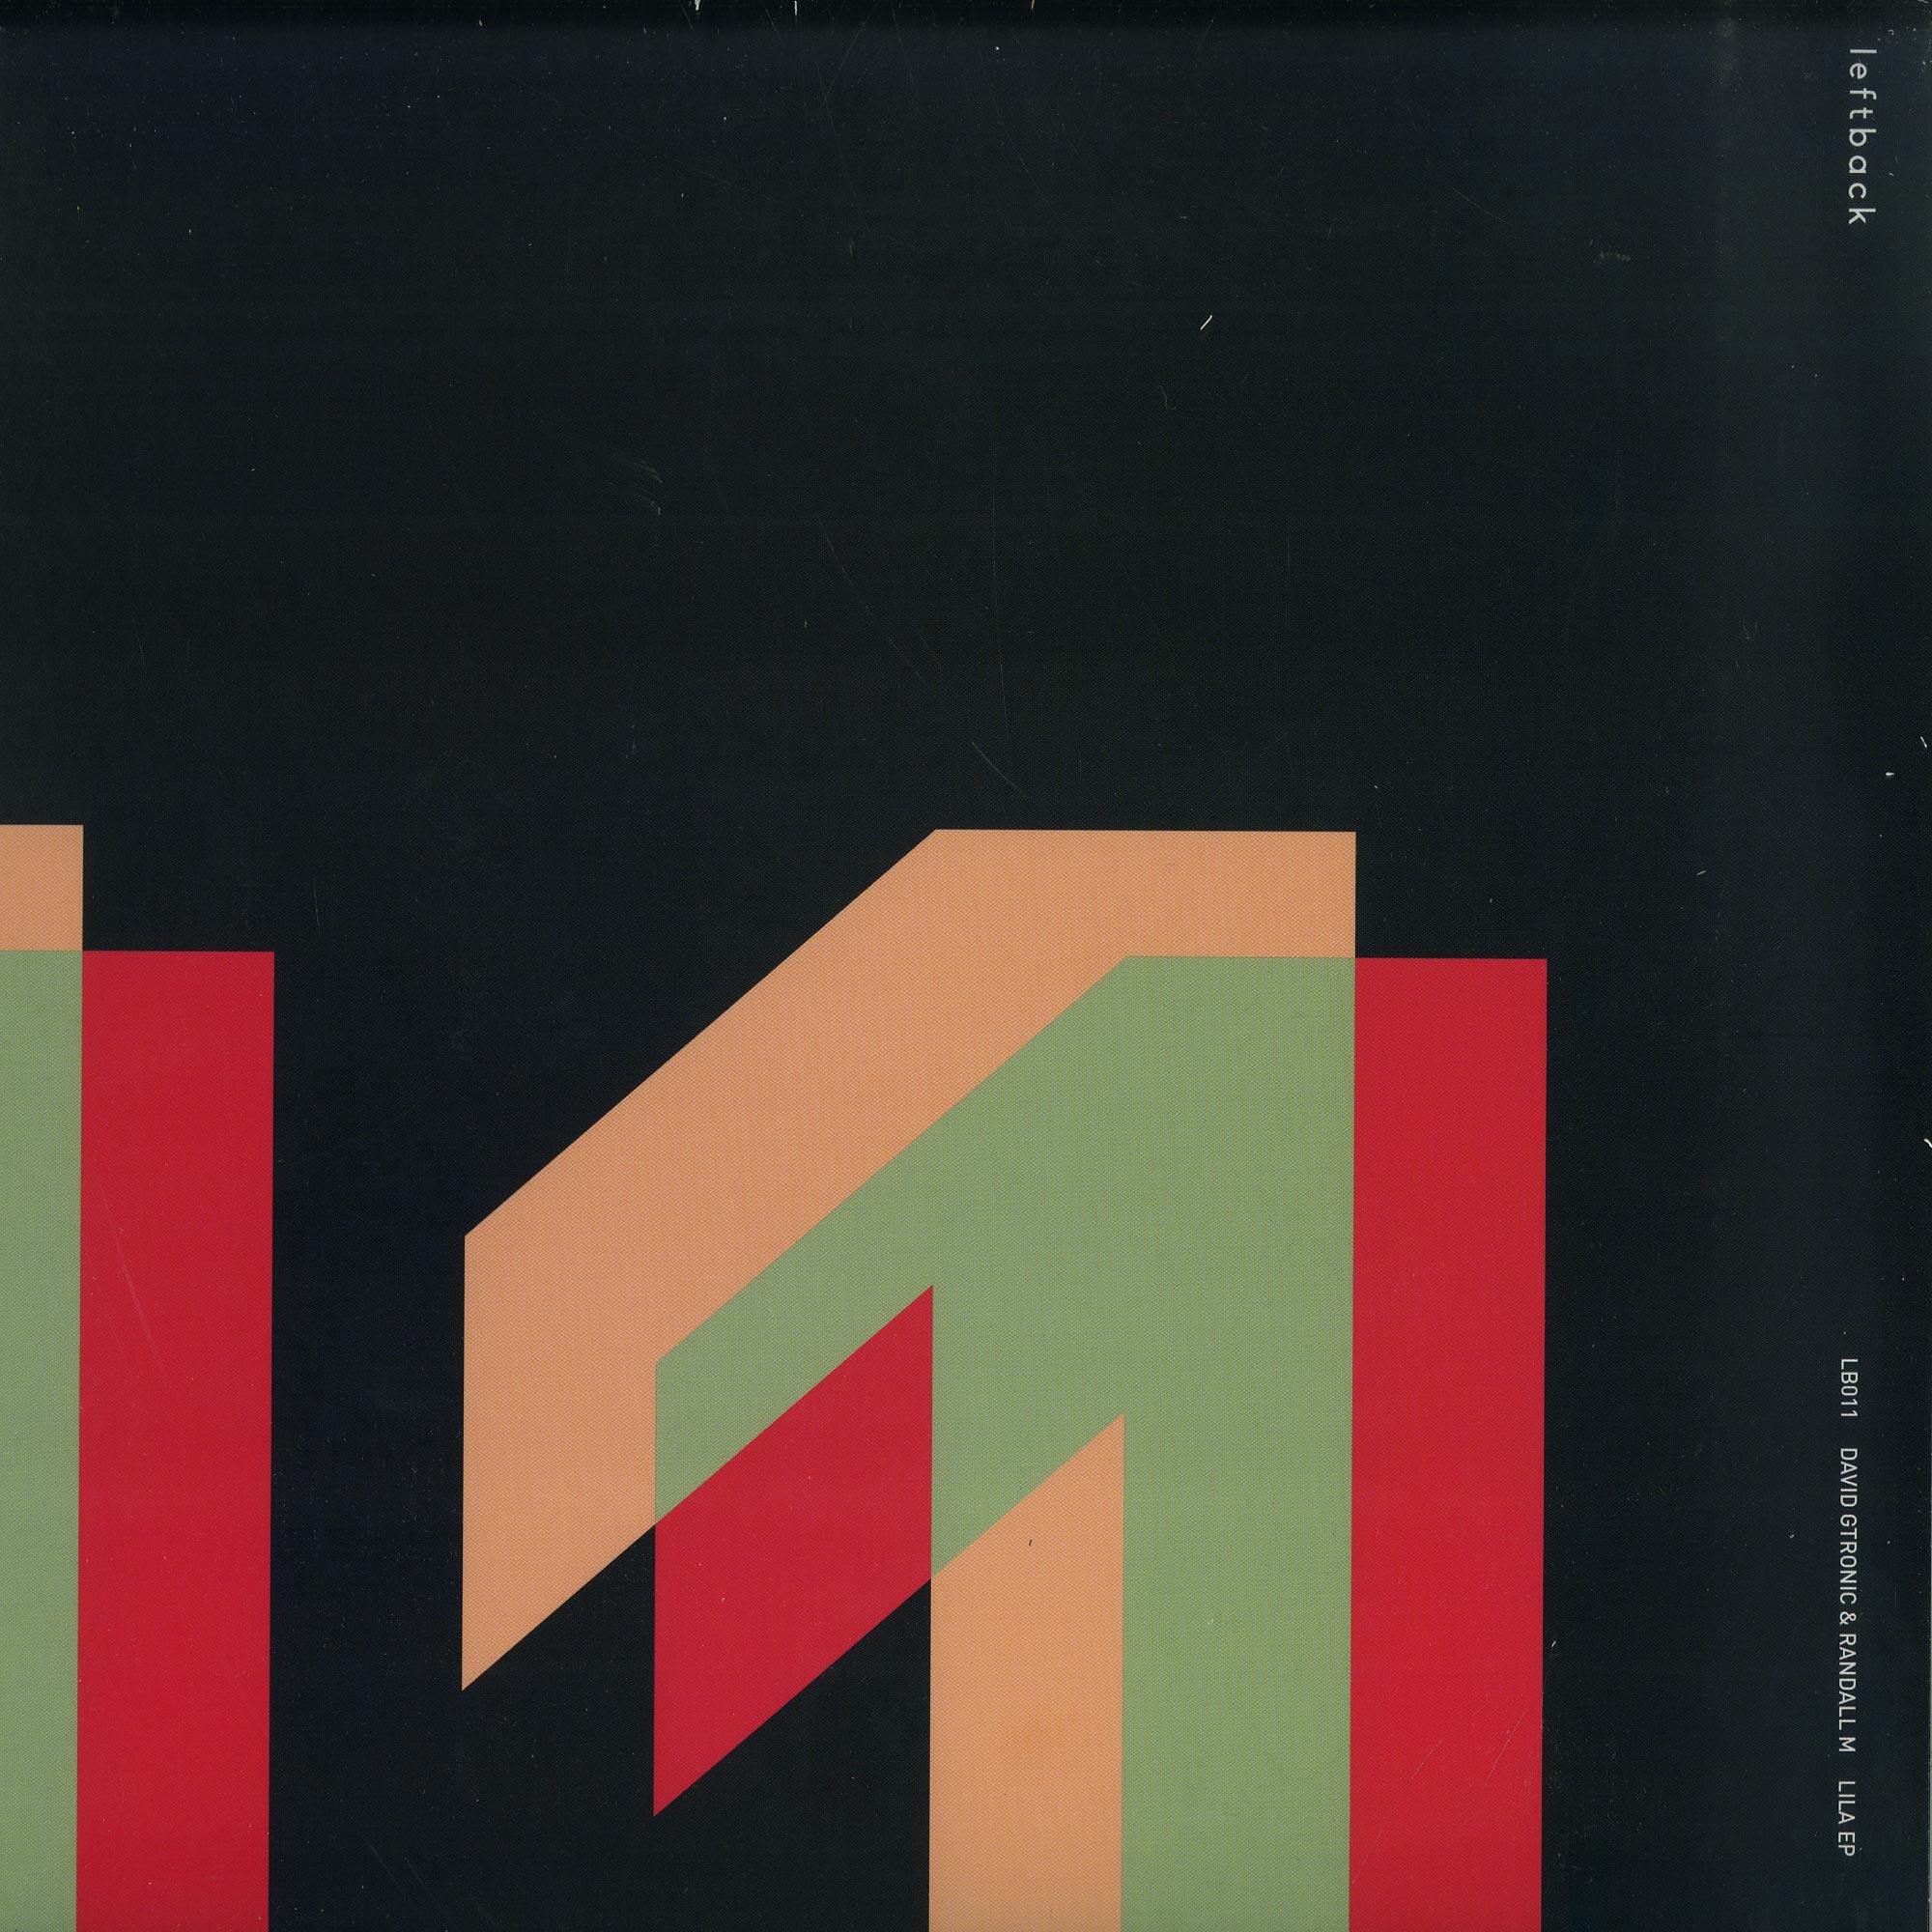 David Gtronic & Randall M - LILA EP